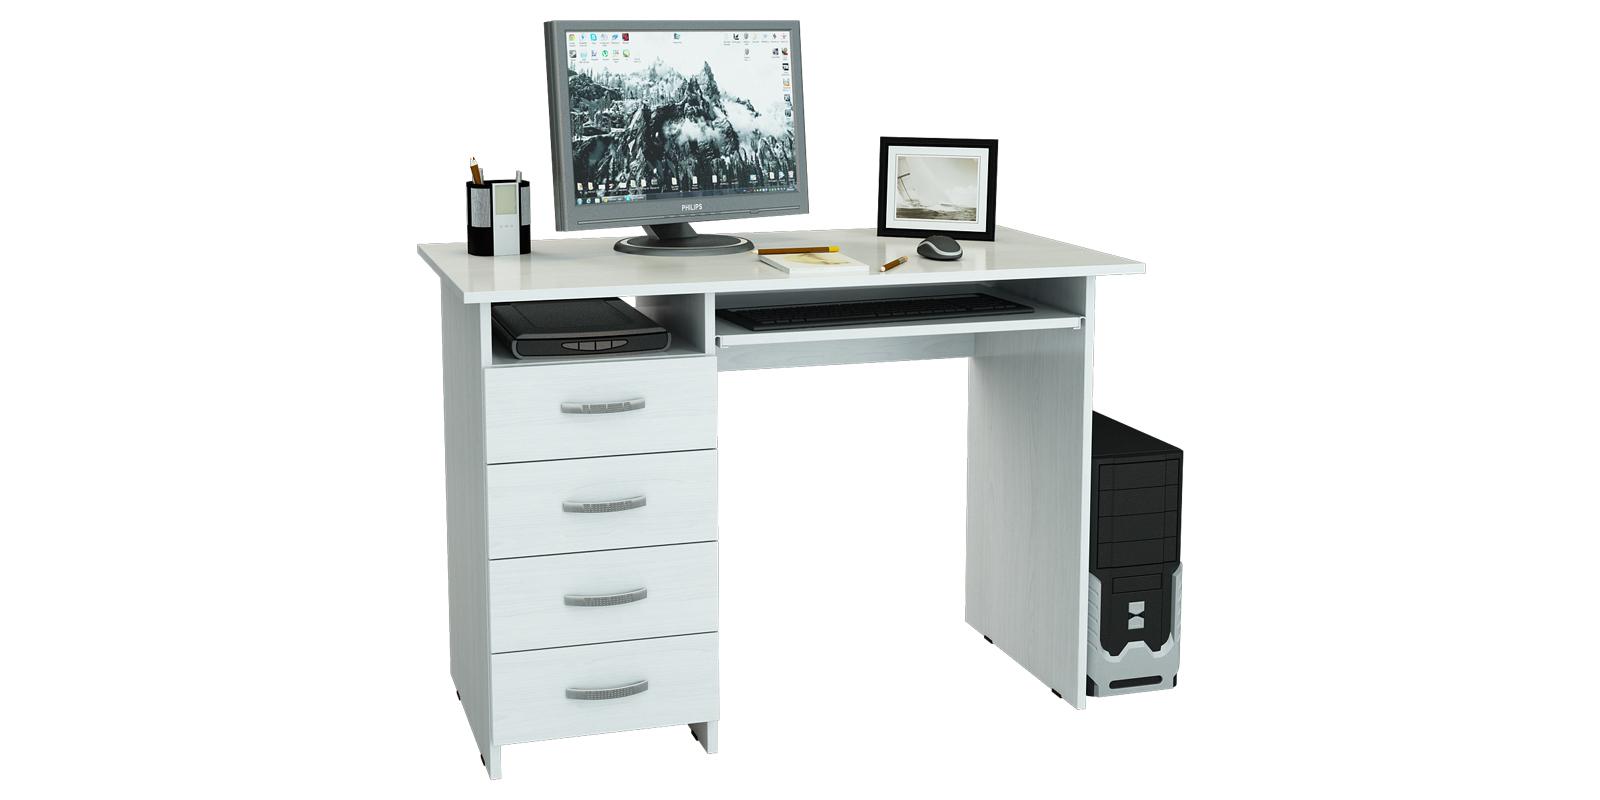 Стол компьютерный Харви левый (белый)